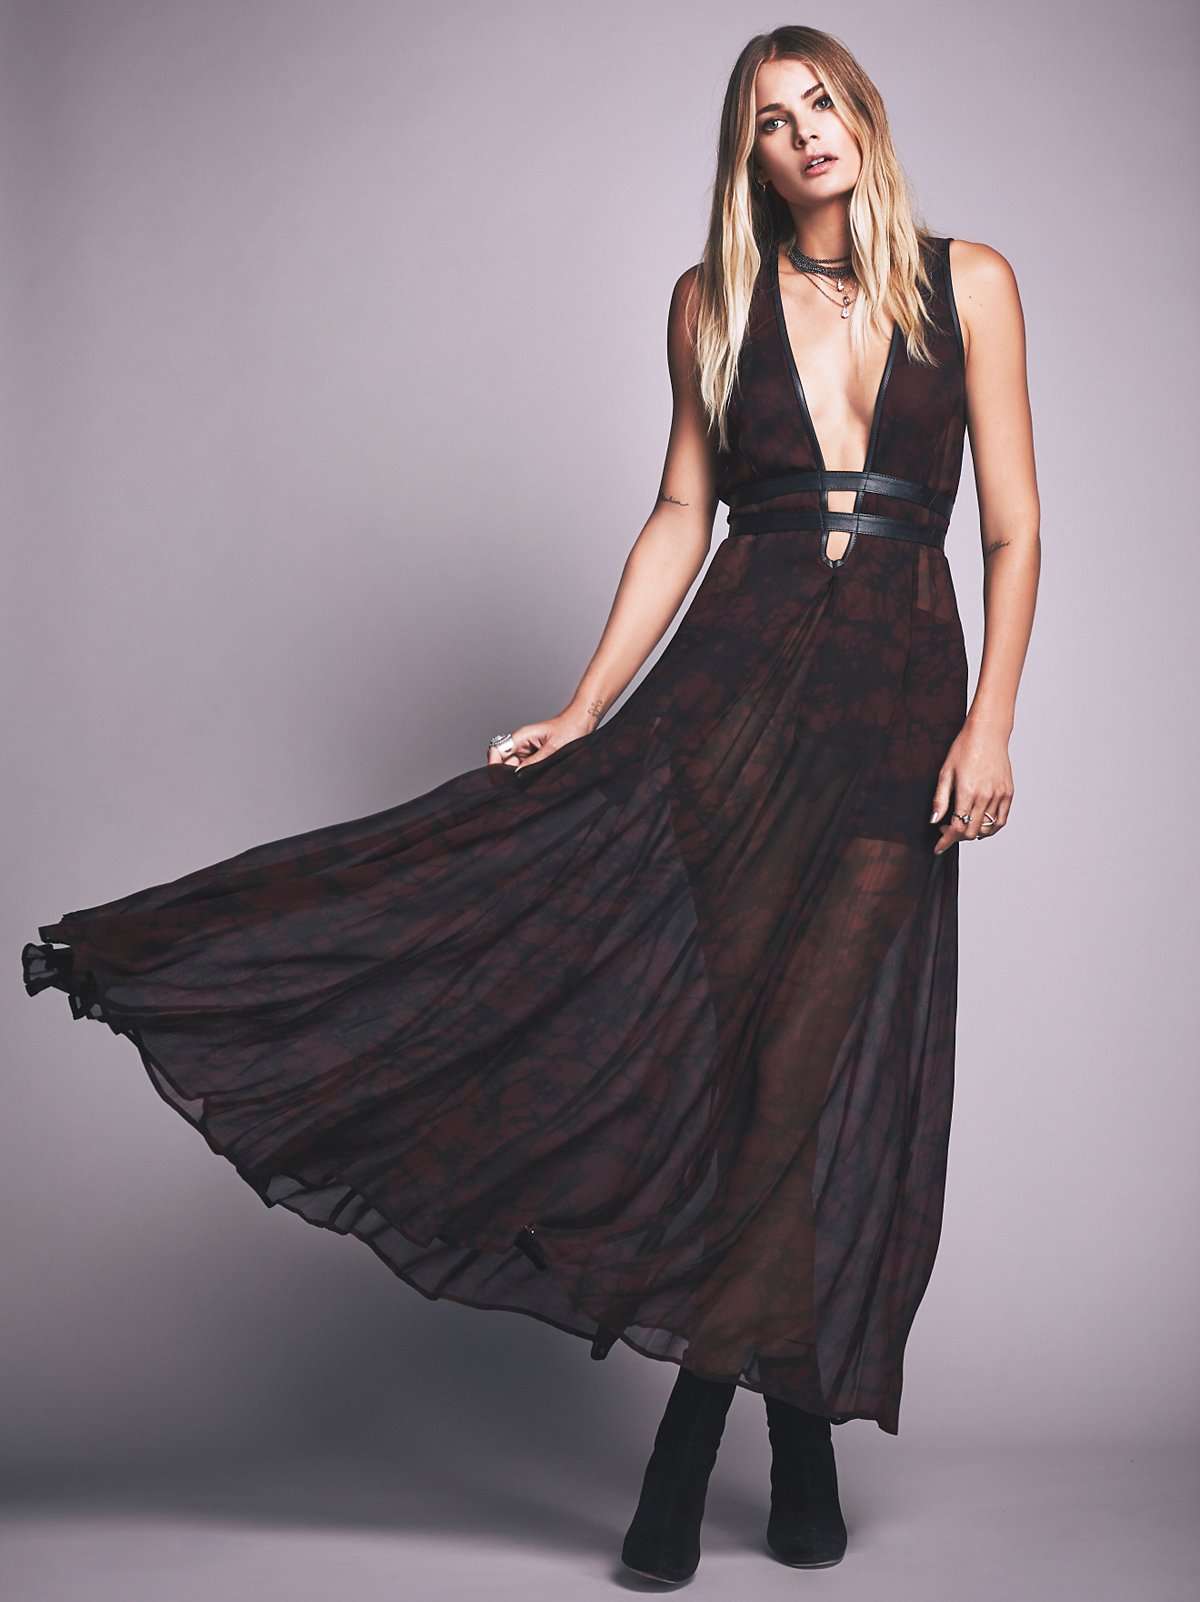 Rhine连衣裙